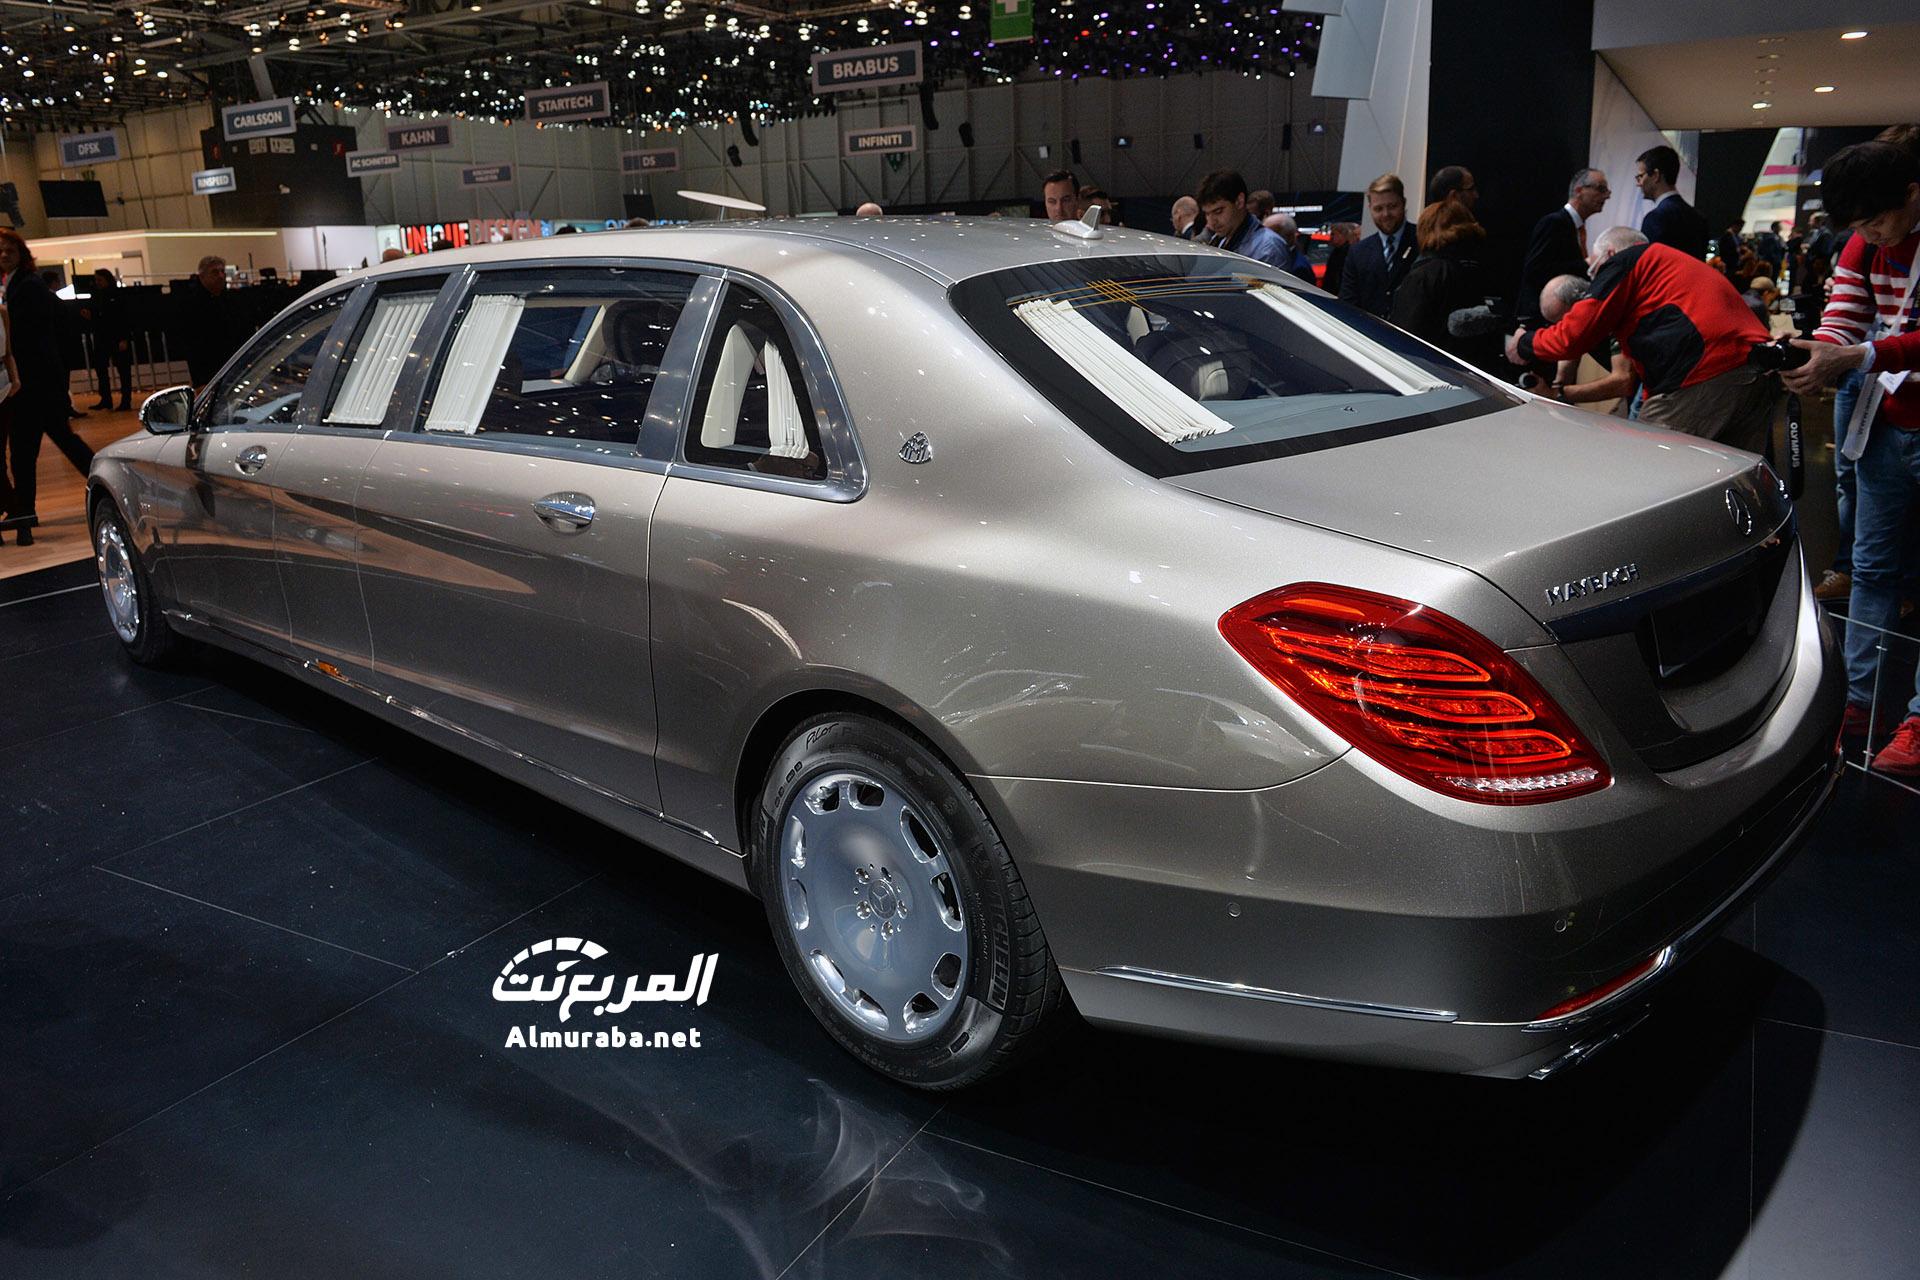 "مرسيدس مايباخ اس 600 بولمان ""تقرير ومواصفات وصور"" Mercedes ..."